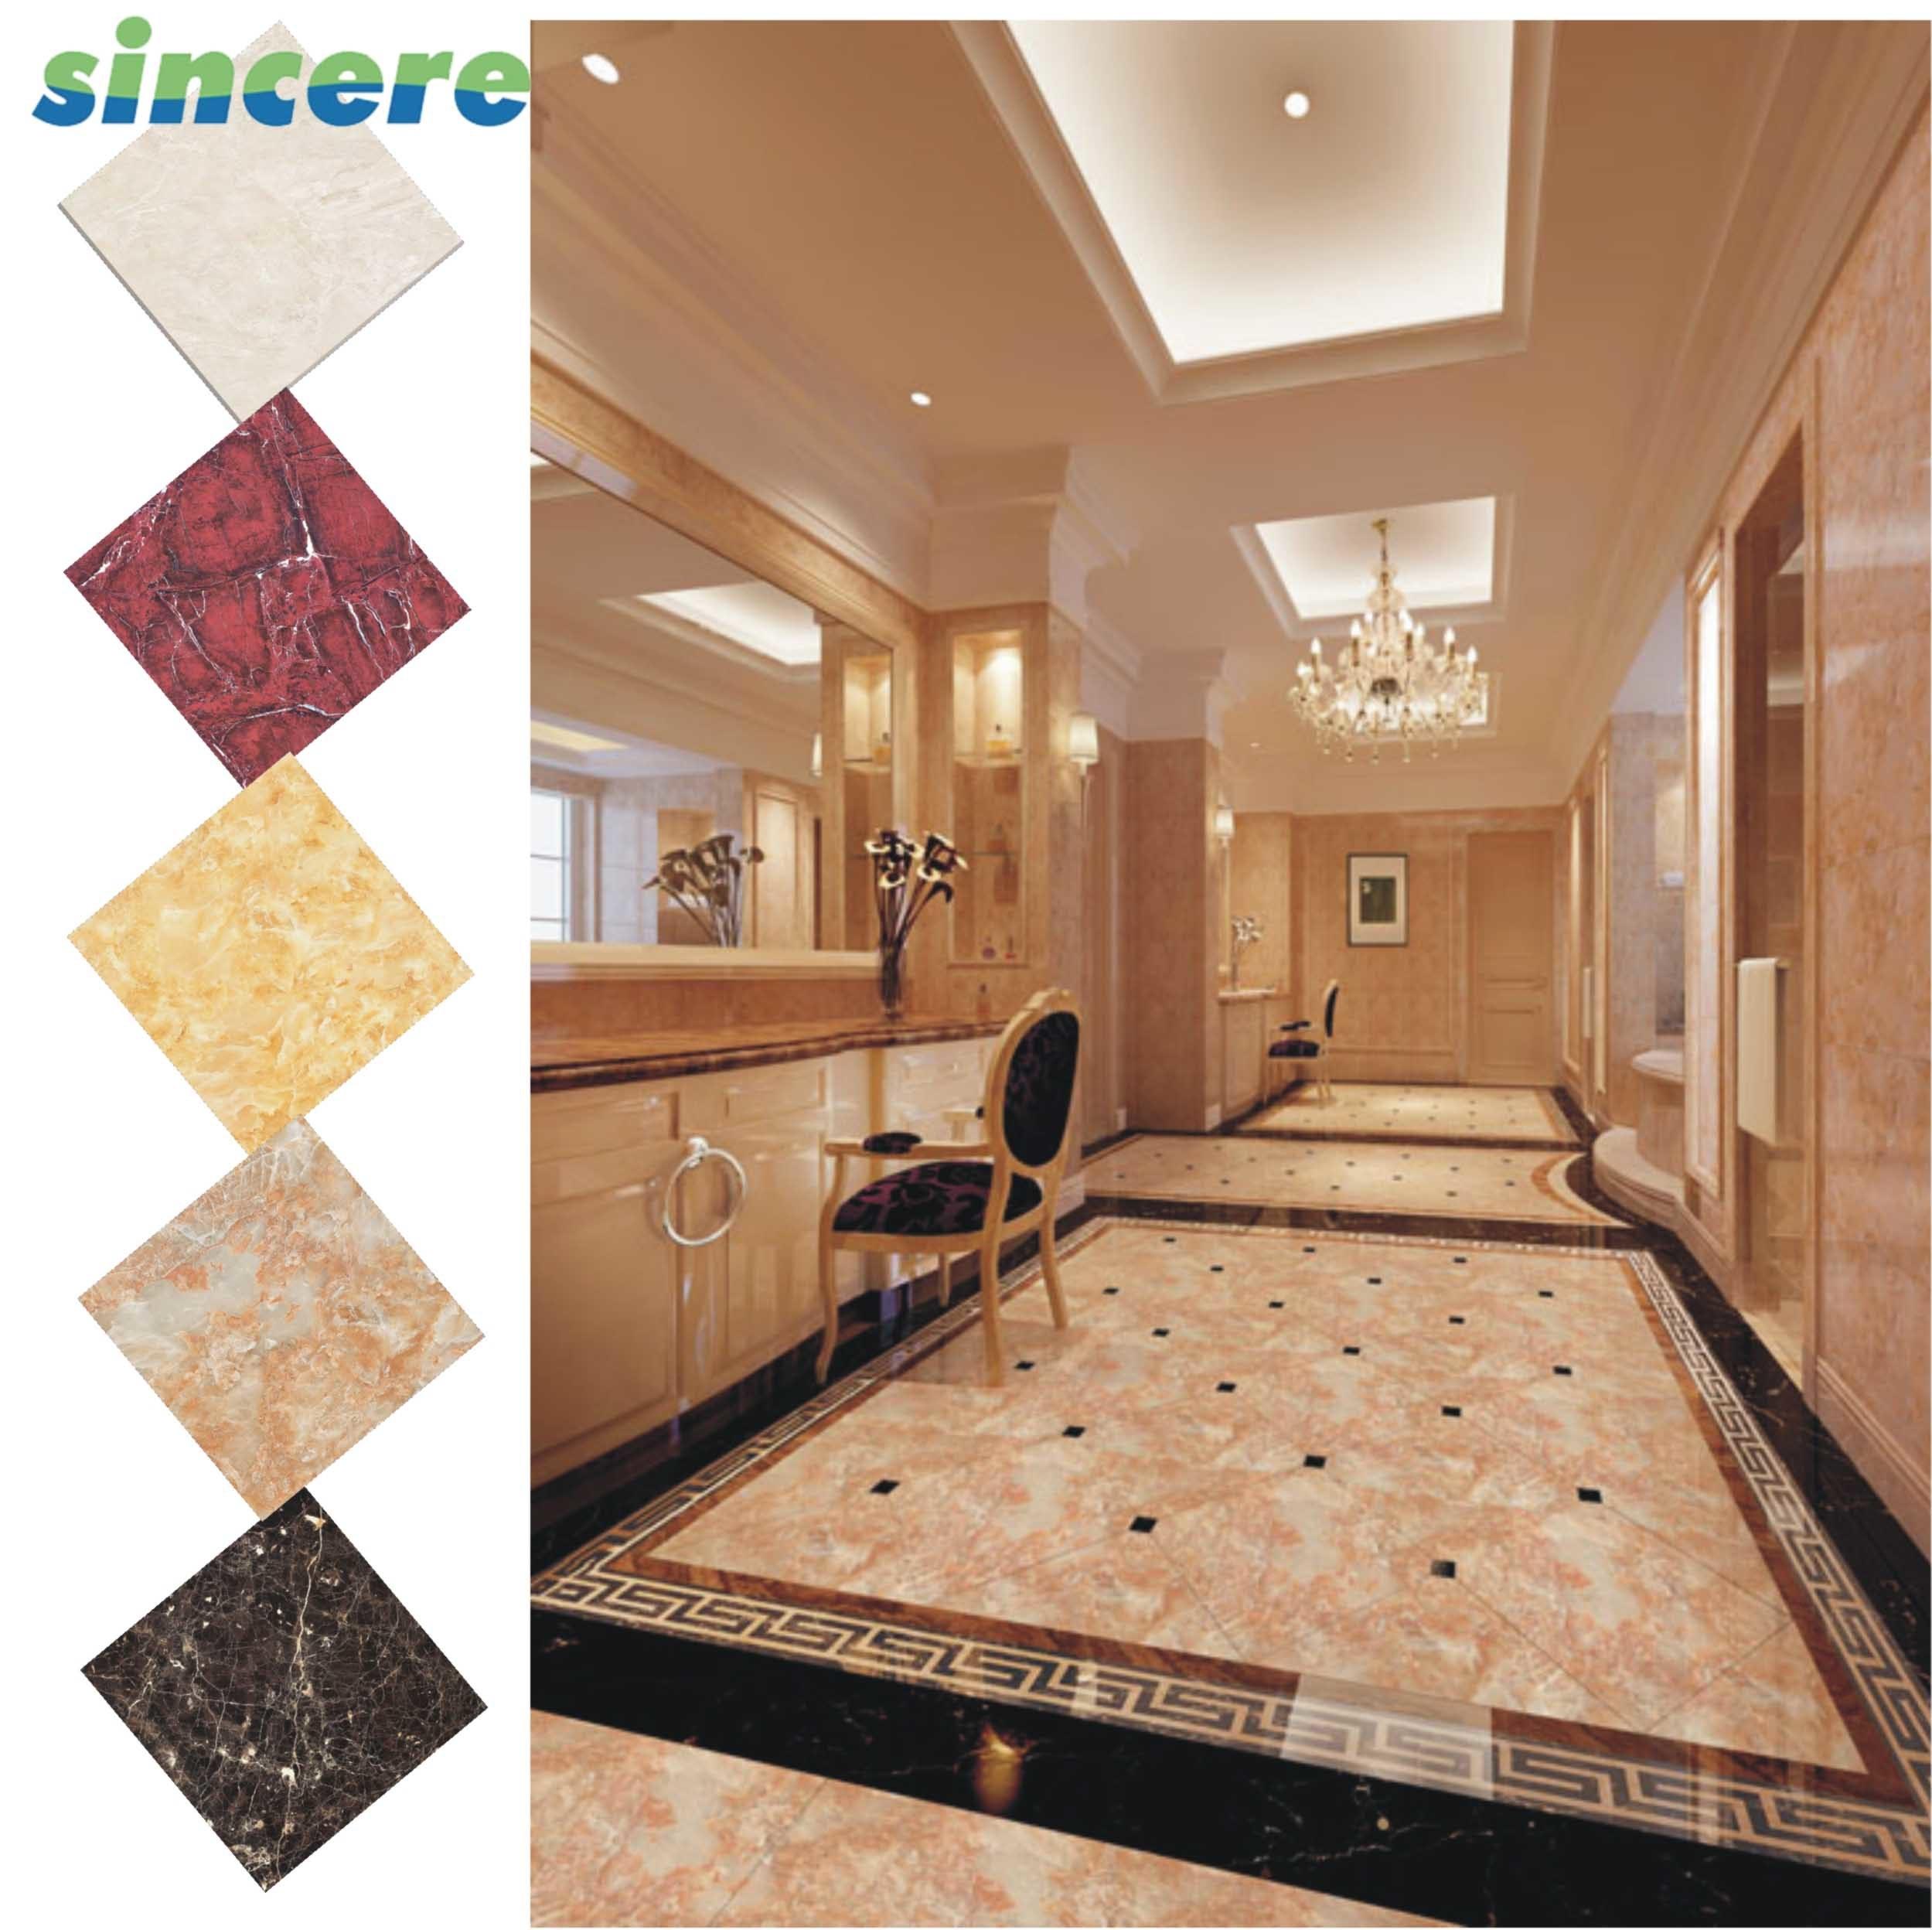 China 600x600 Household Bathroom Wall Modern Marble Pattern Tile Floor With Ciq China Tile Floor Pattern Tile Floor